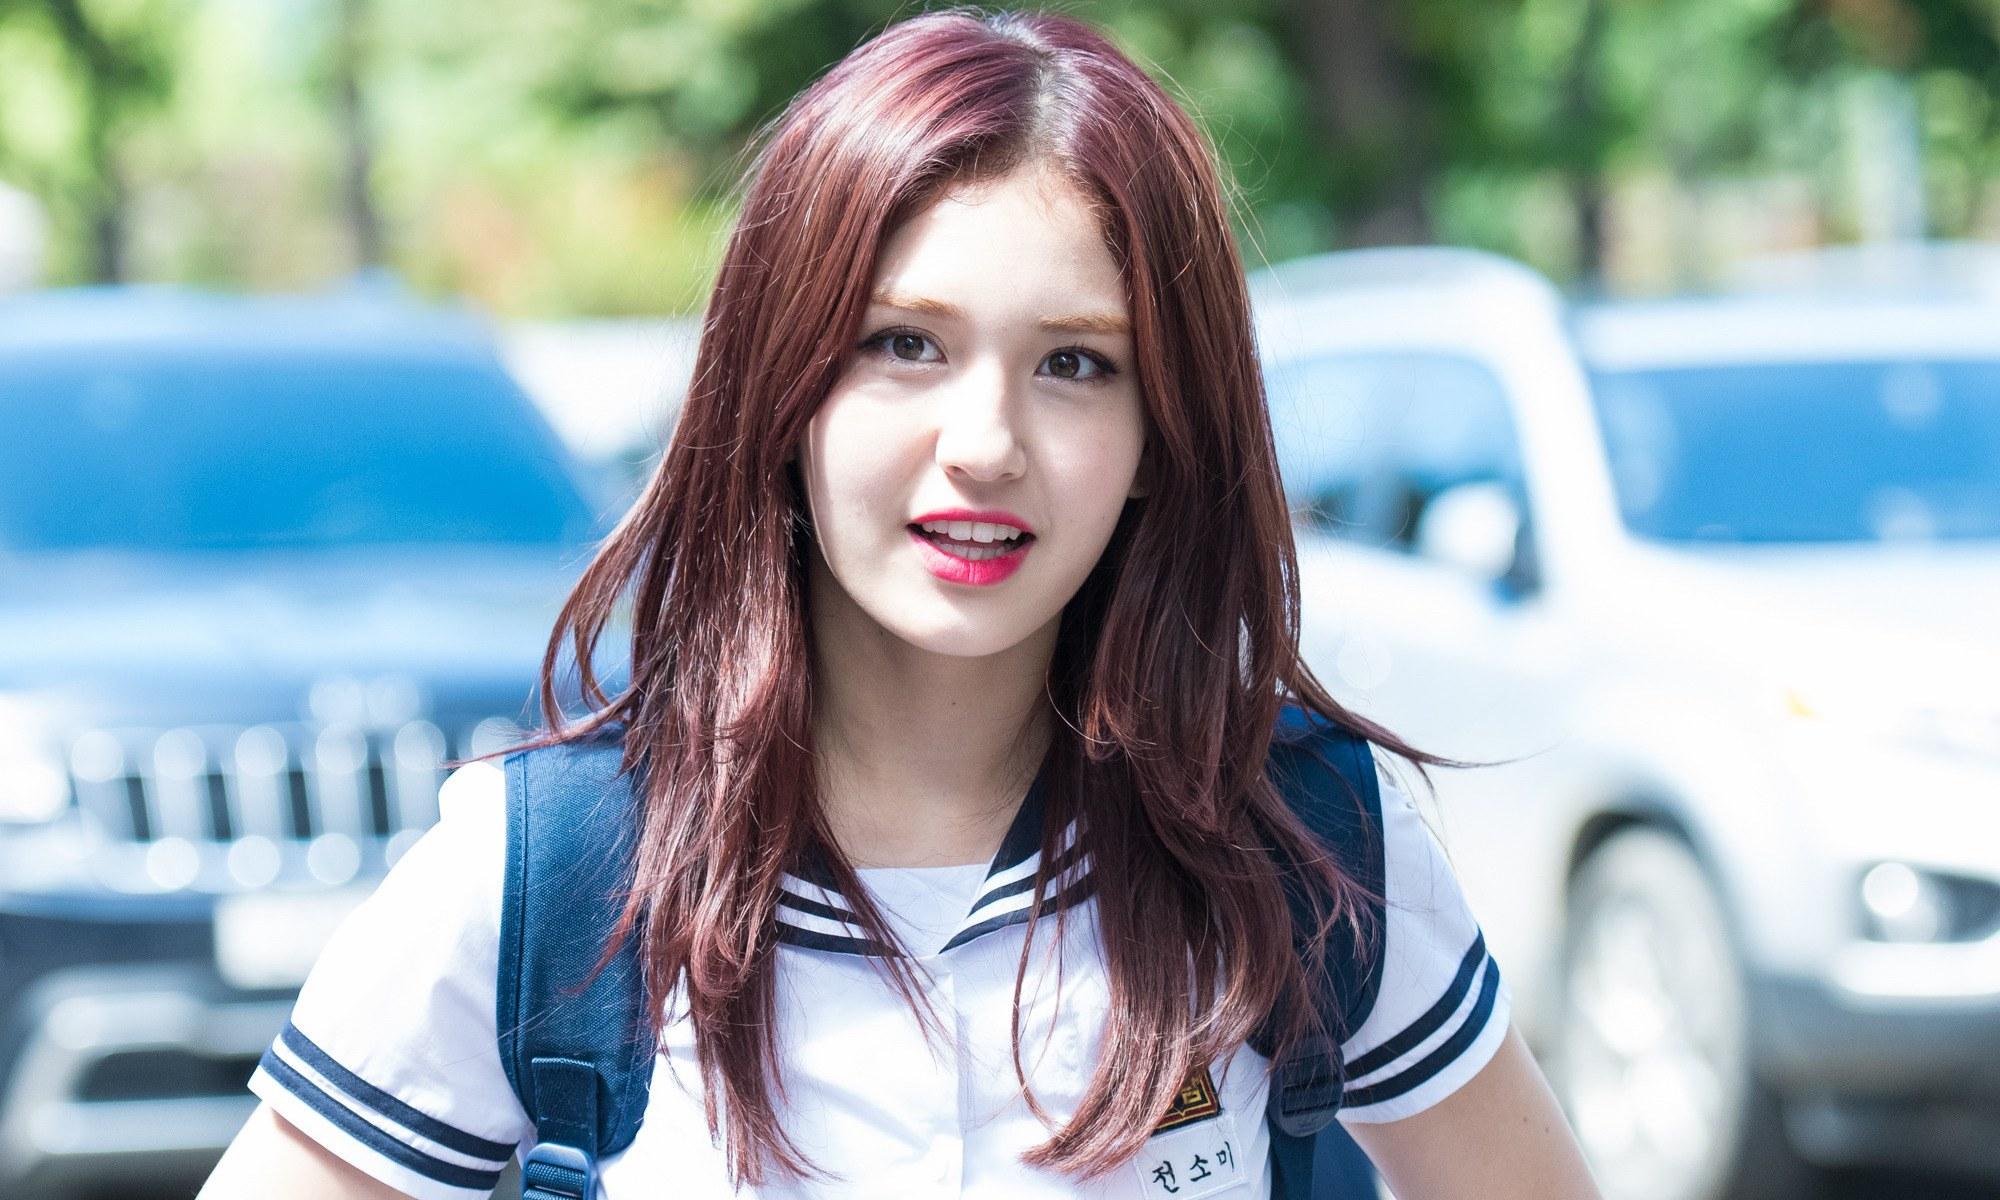 Meet Jyp Entertainment S New Generation Of Trainees Koreaboo